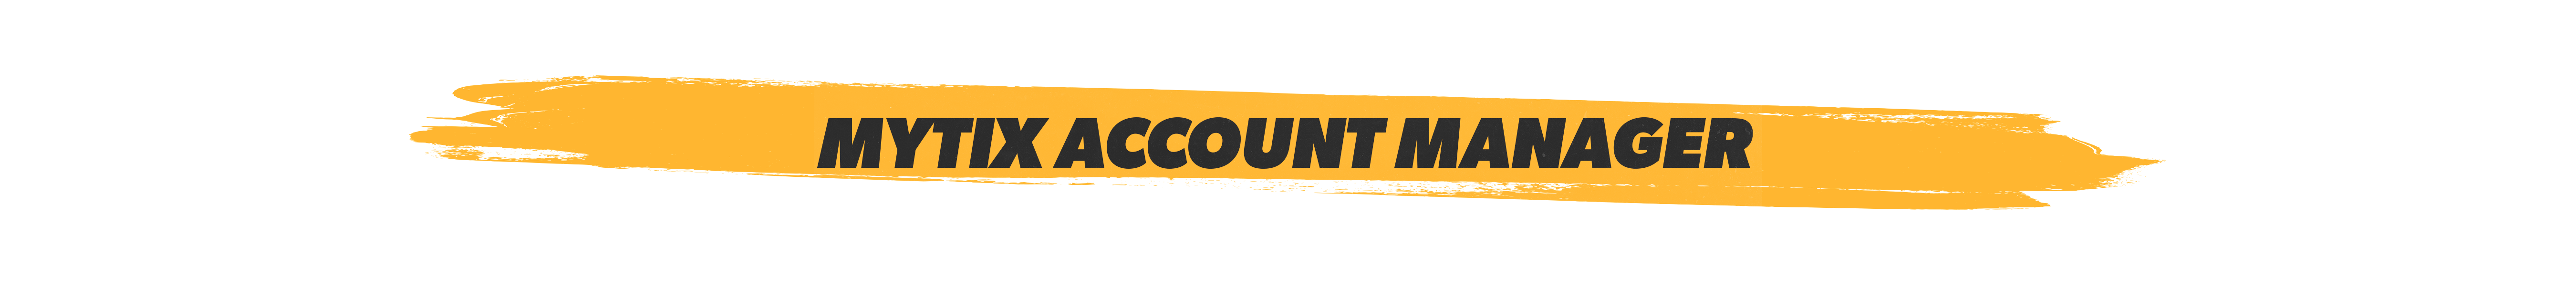 mytixaccount manager (web square)